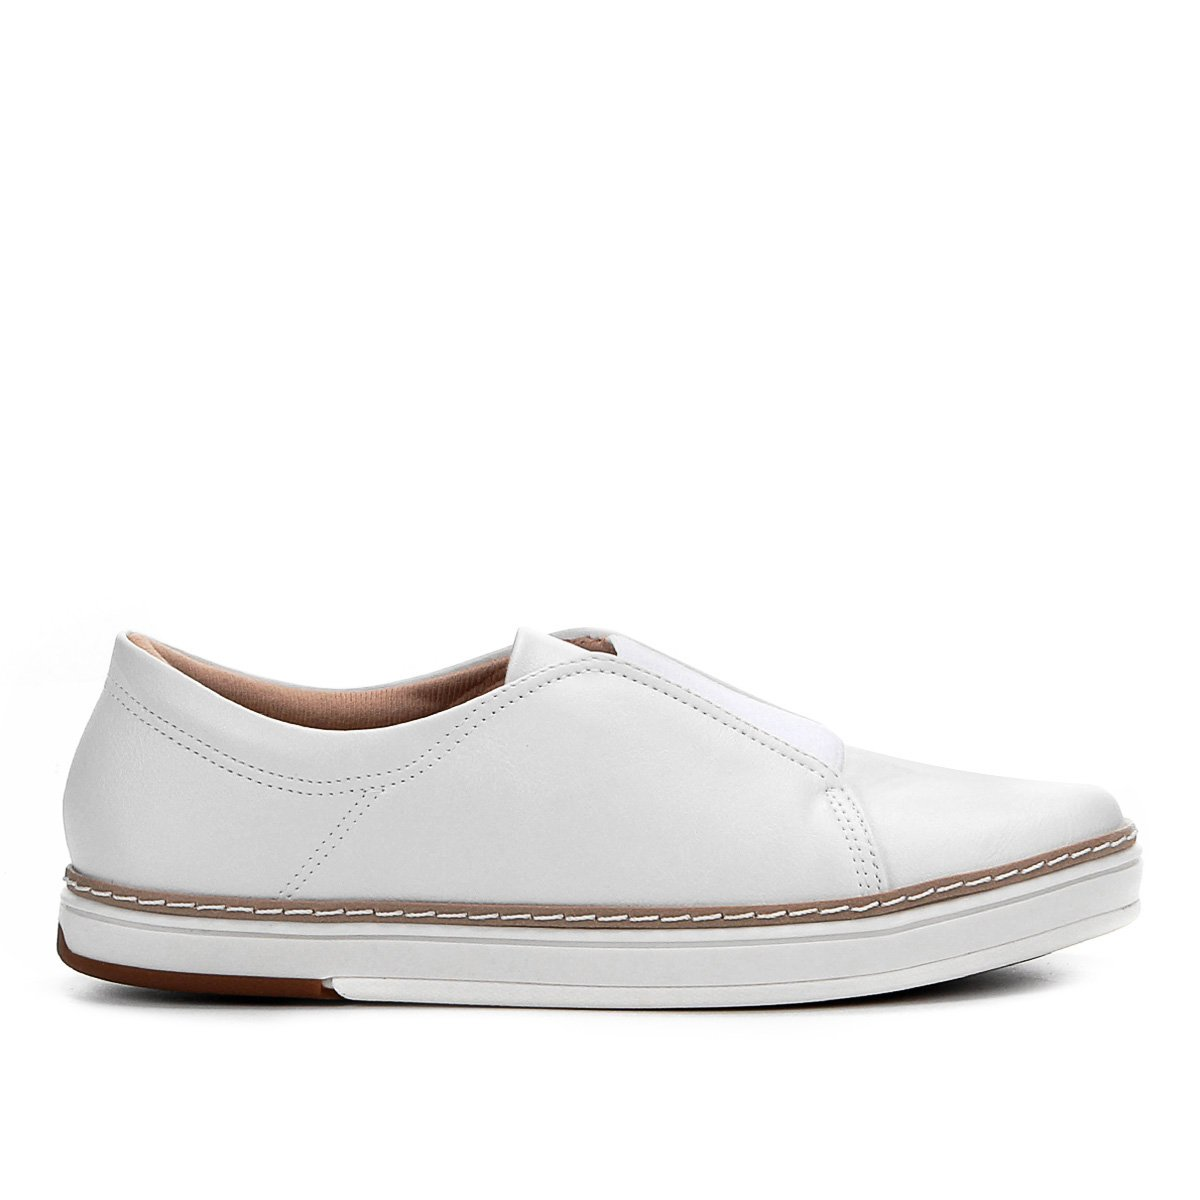 Modare Feminino Slip Slip Modare Elástico Feminino Slip On Branco Elástico Elástico On Modare Branco On qExZwUFnX